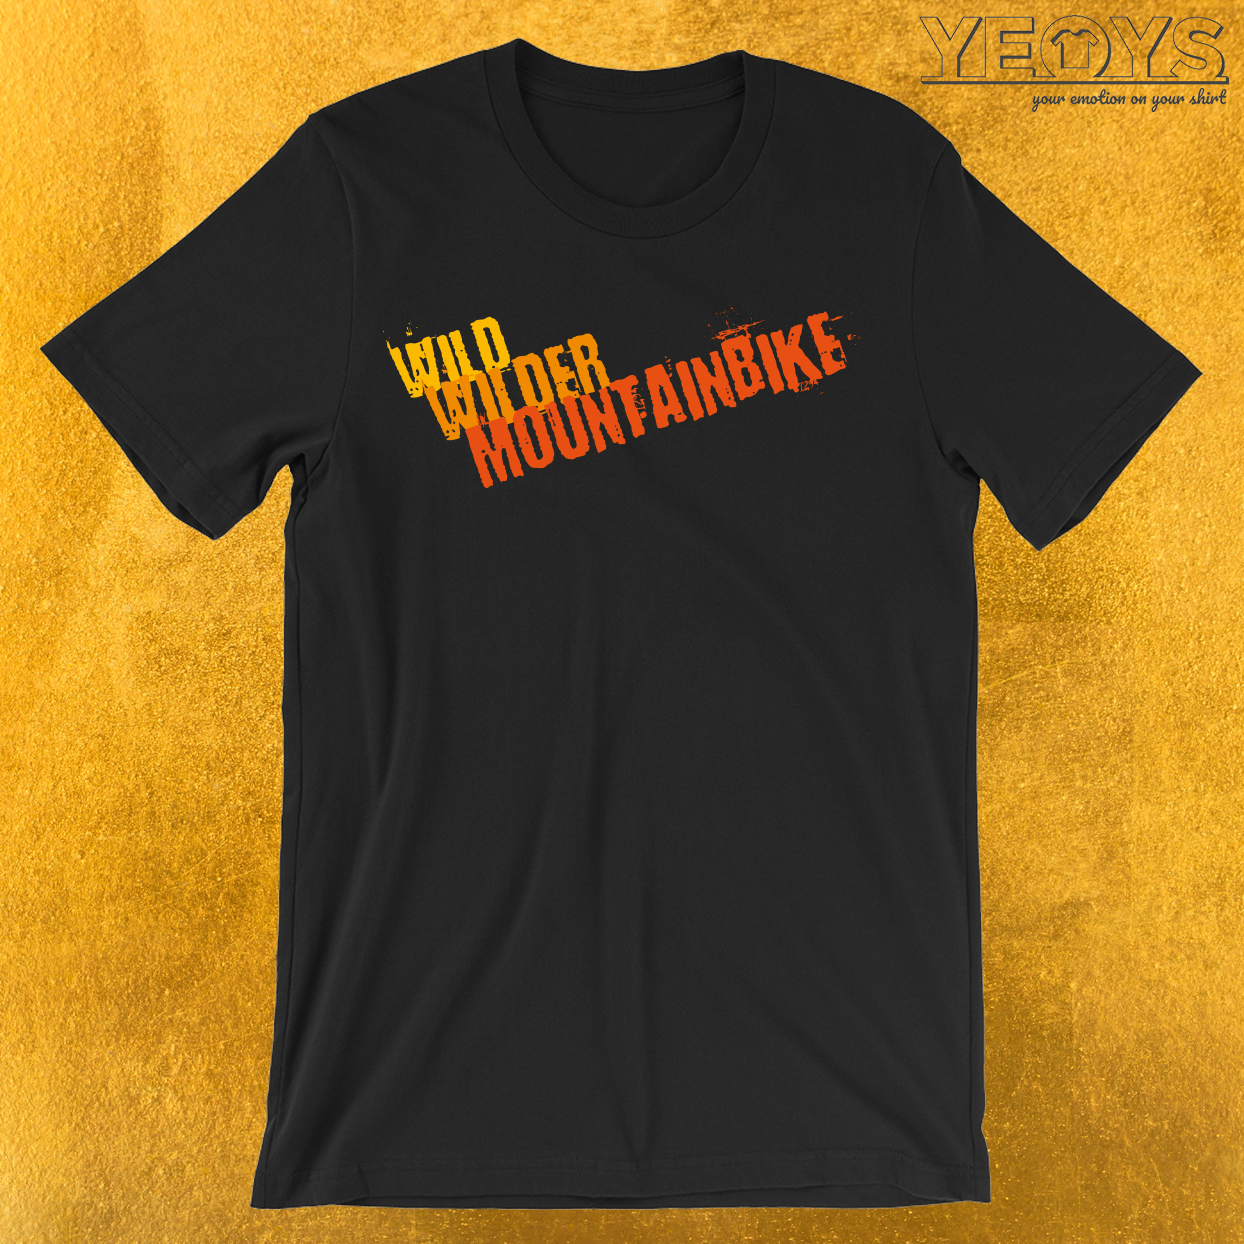 Wild Wilder Mountainbike T-Shirt